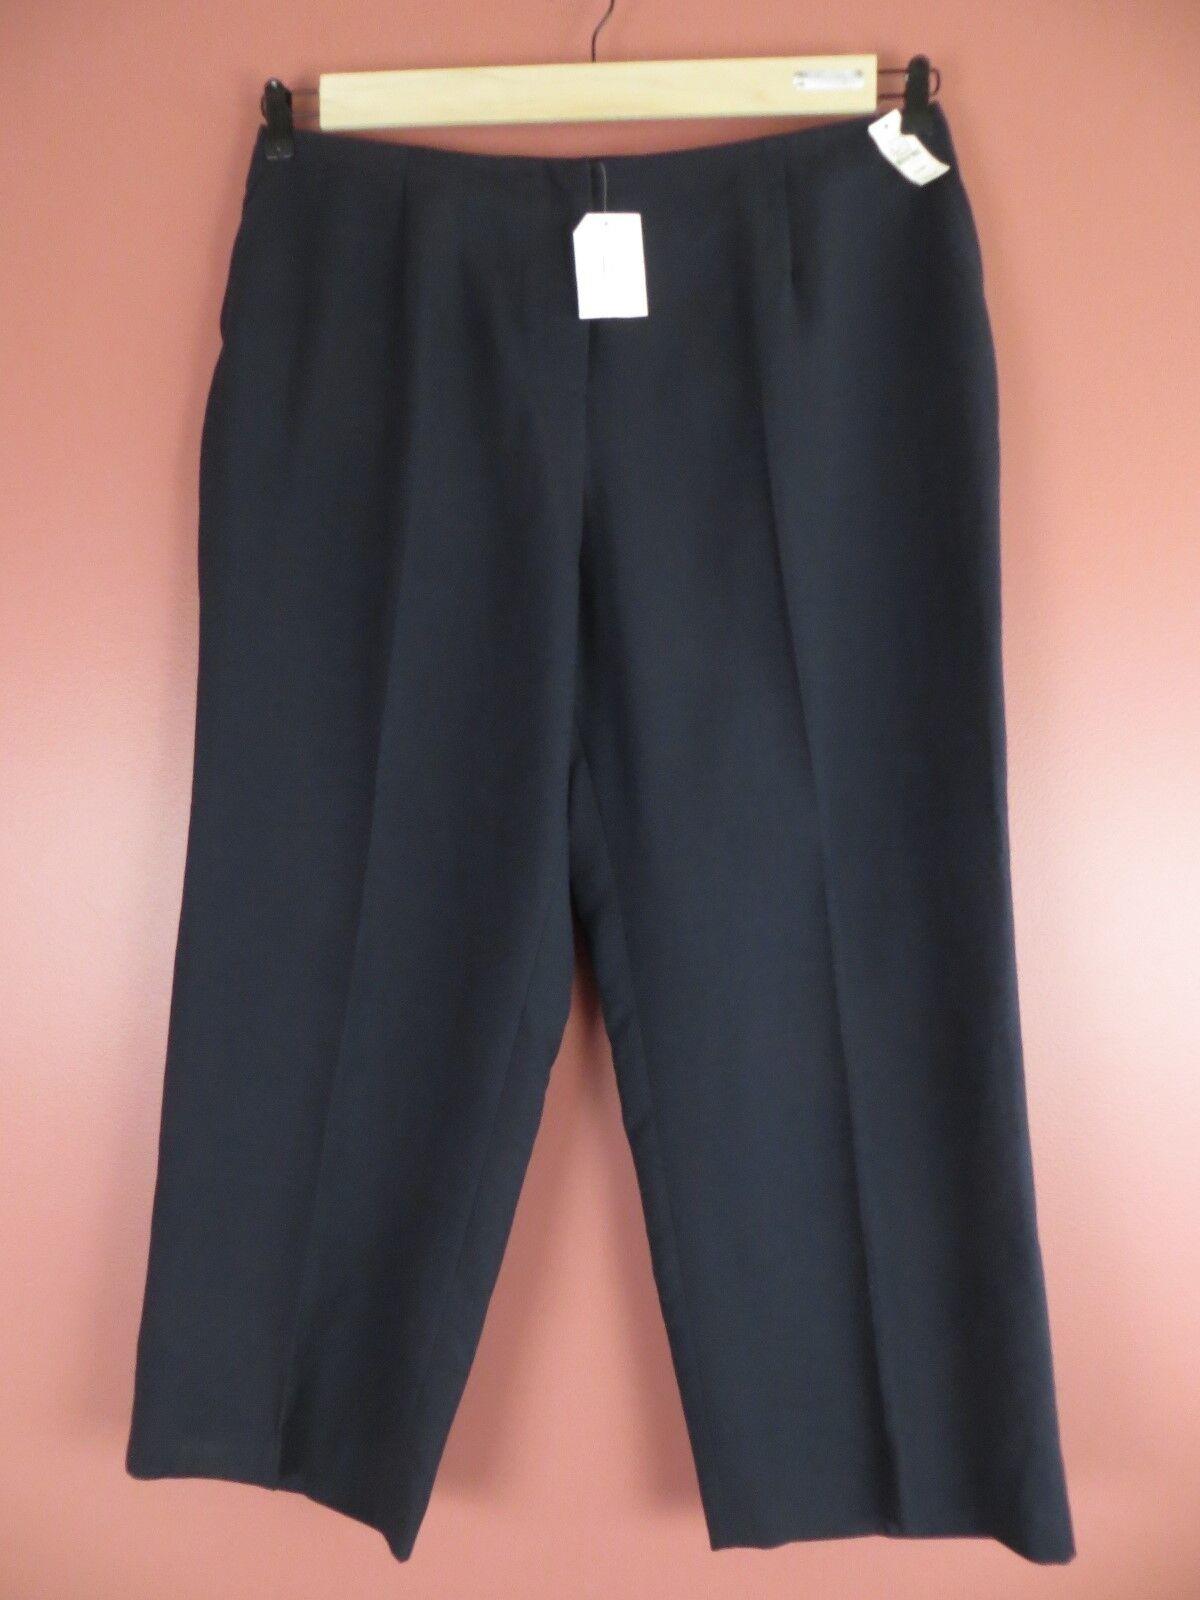 PNS0960-NWT TALBOTS Women Classic Cotton Lyocell Dress Pants Navy bluee 22WP  136